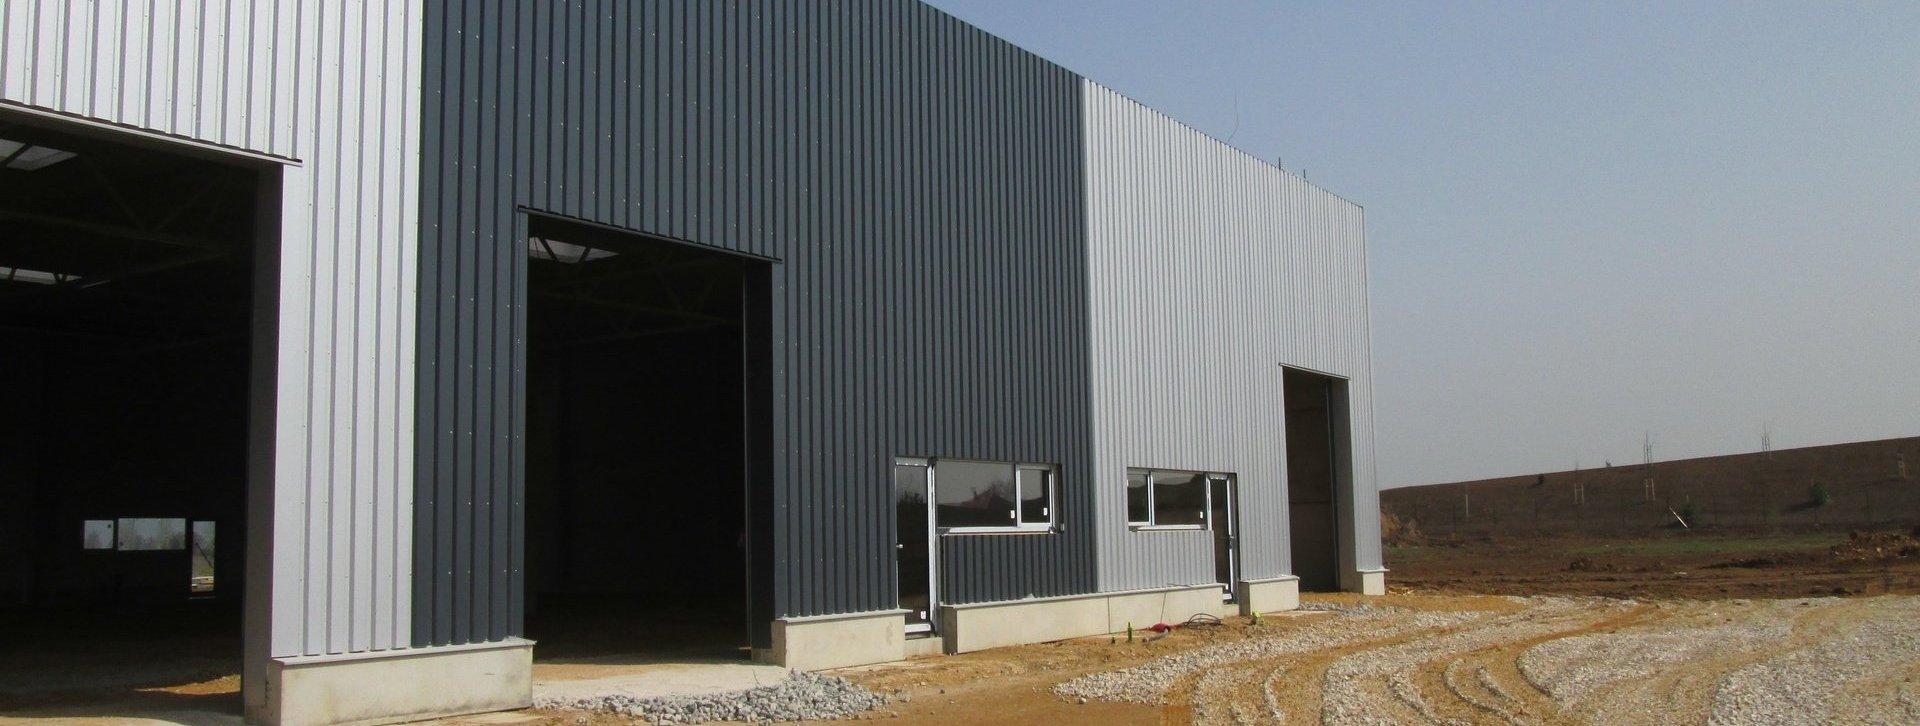 moderni-skladove-jednotky-az-1-582-m2-praha-zapad-img-0271-c82f2e